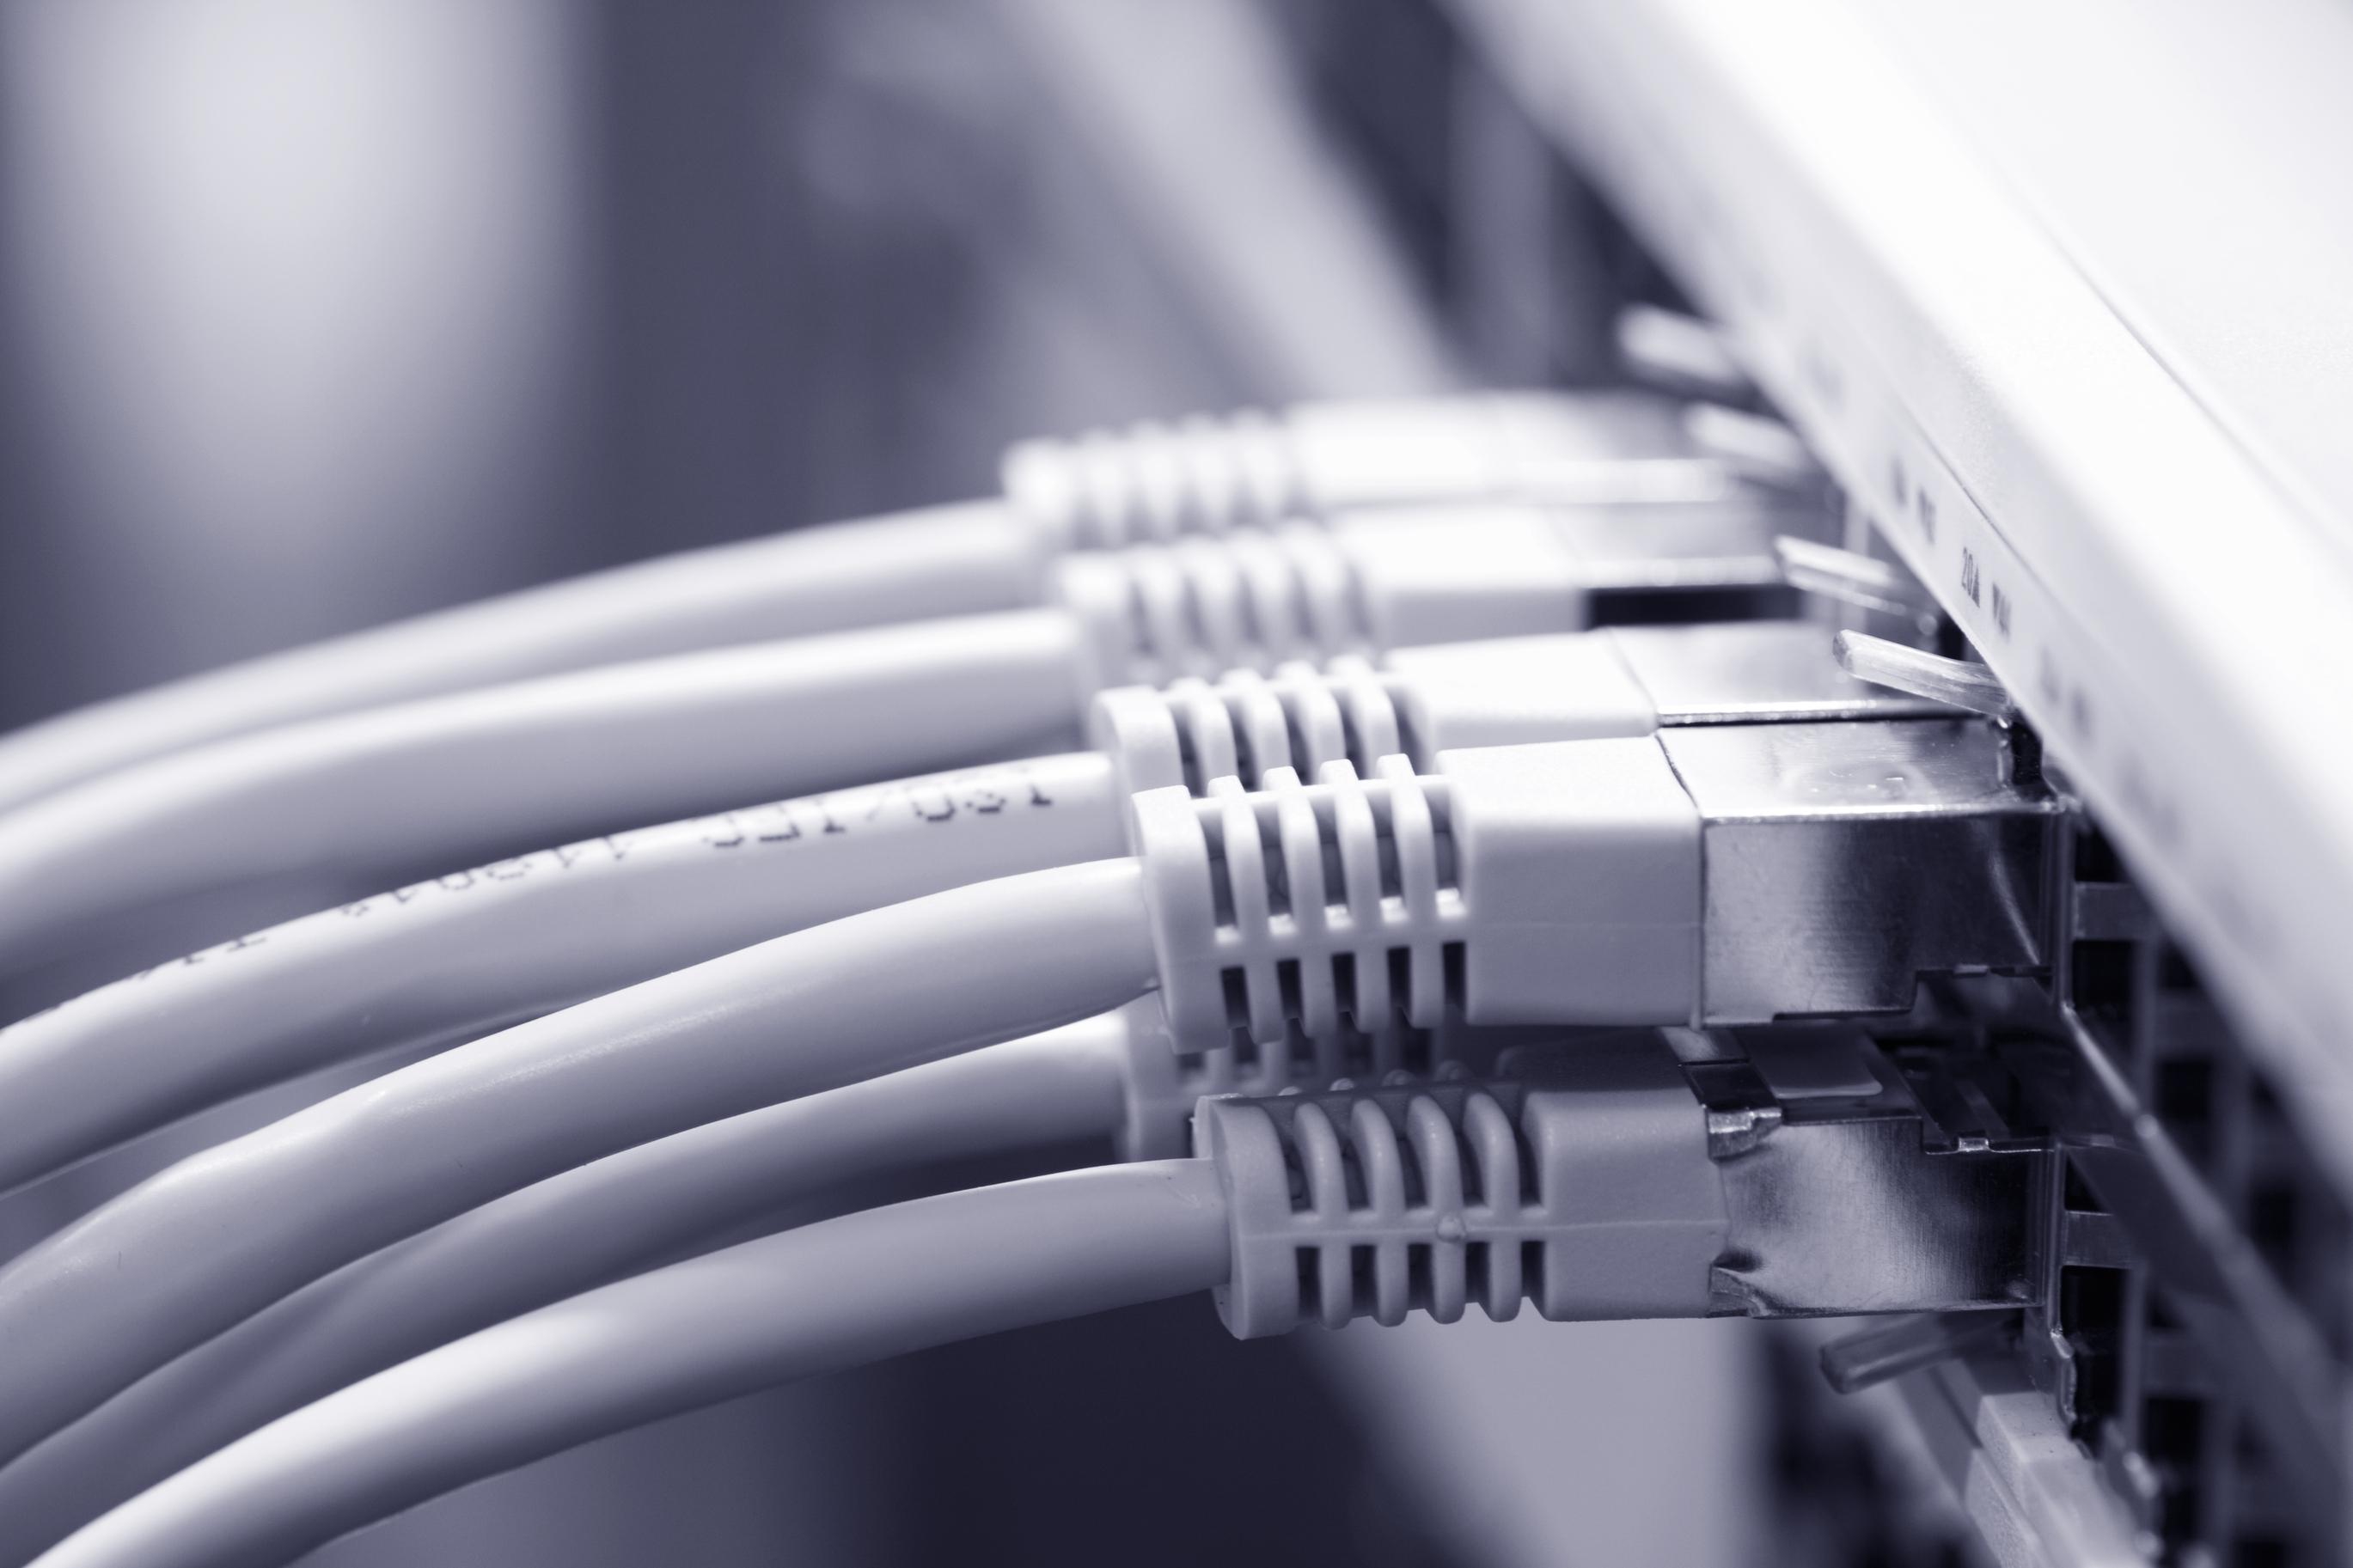 Nomino - zarządzanie sieciami LAN/WAN/WLAN/VPN